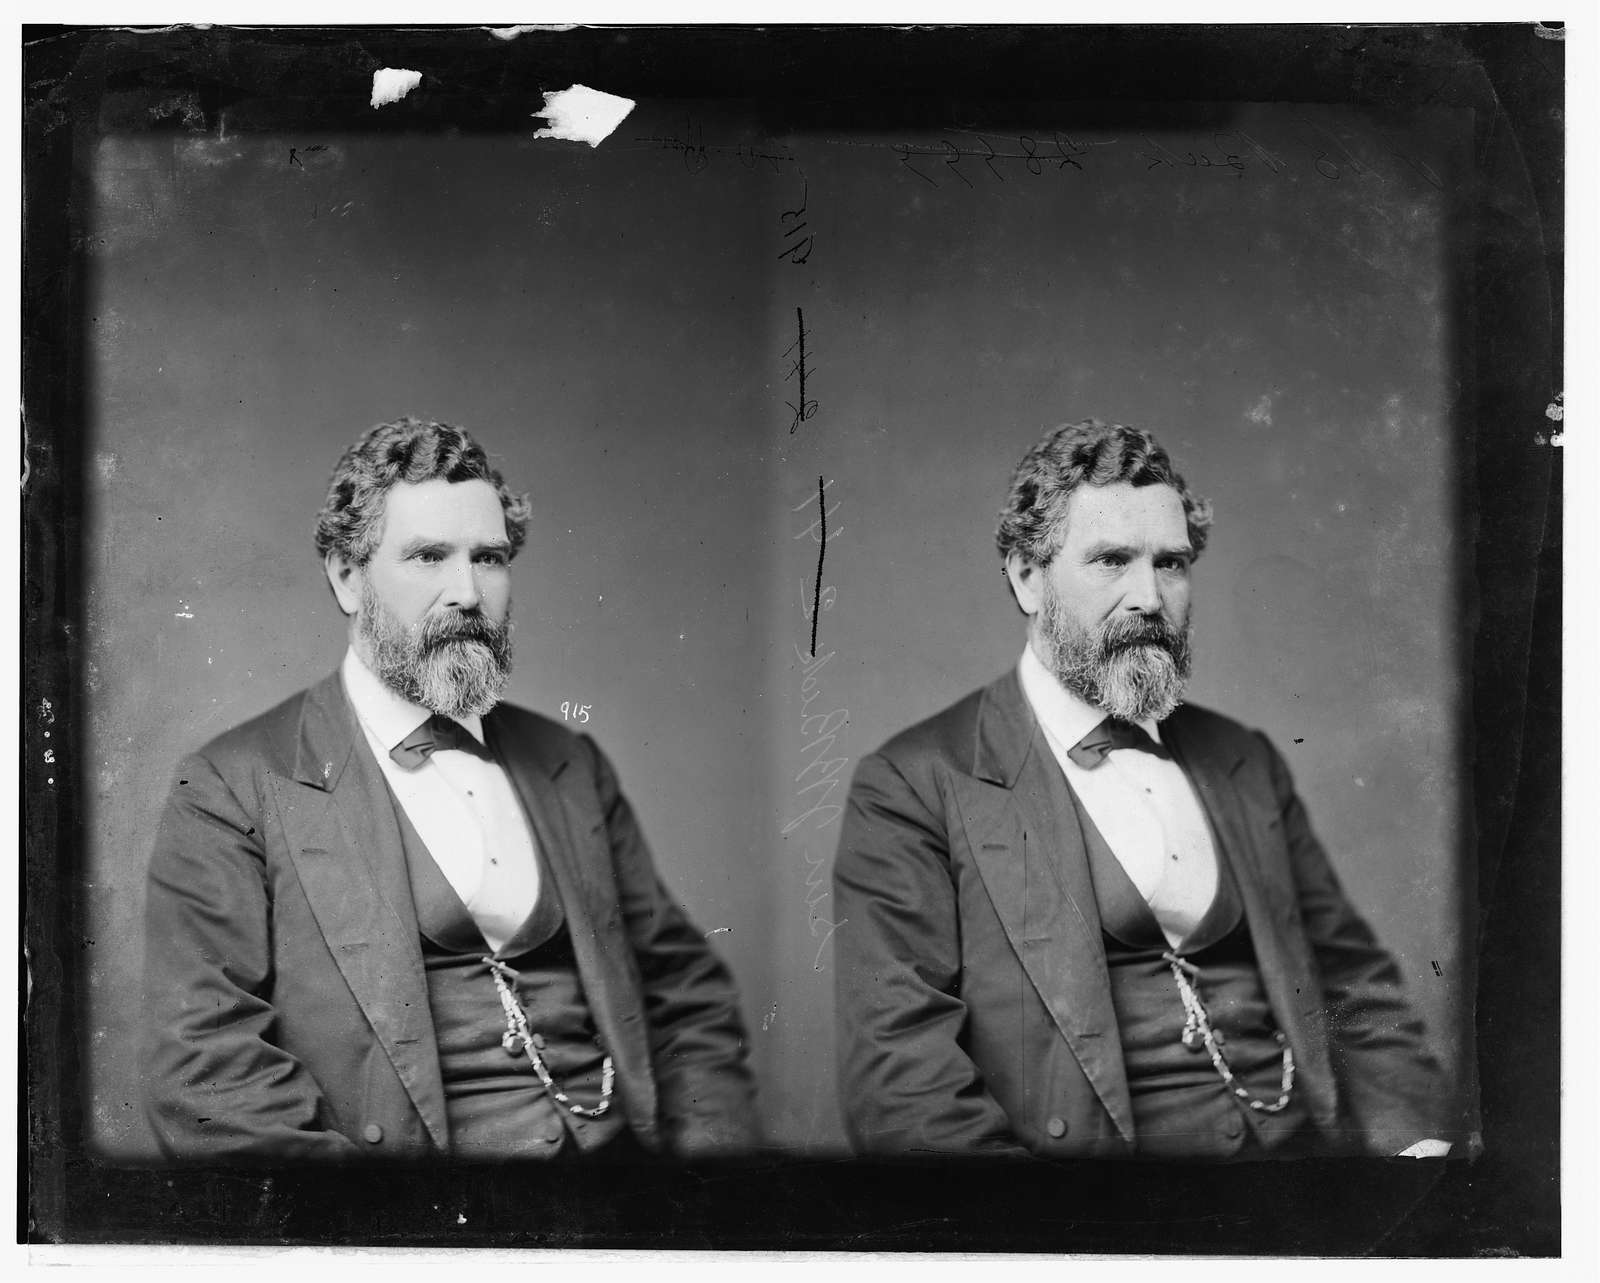 Beck, Hon. James Burnie of Ky